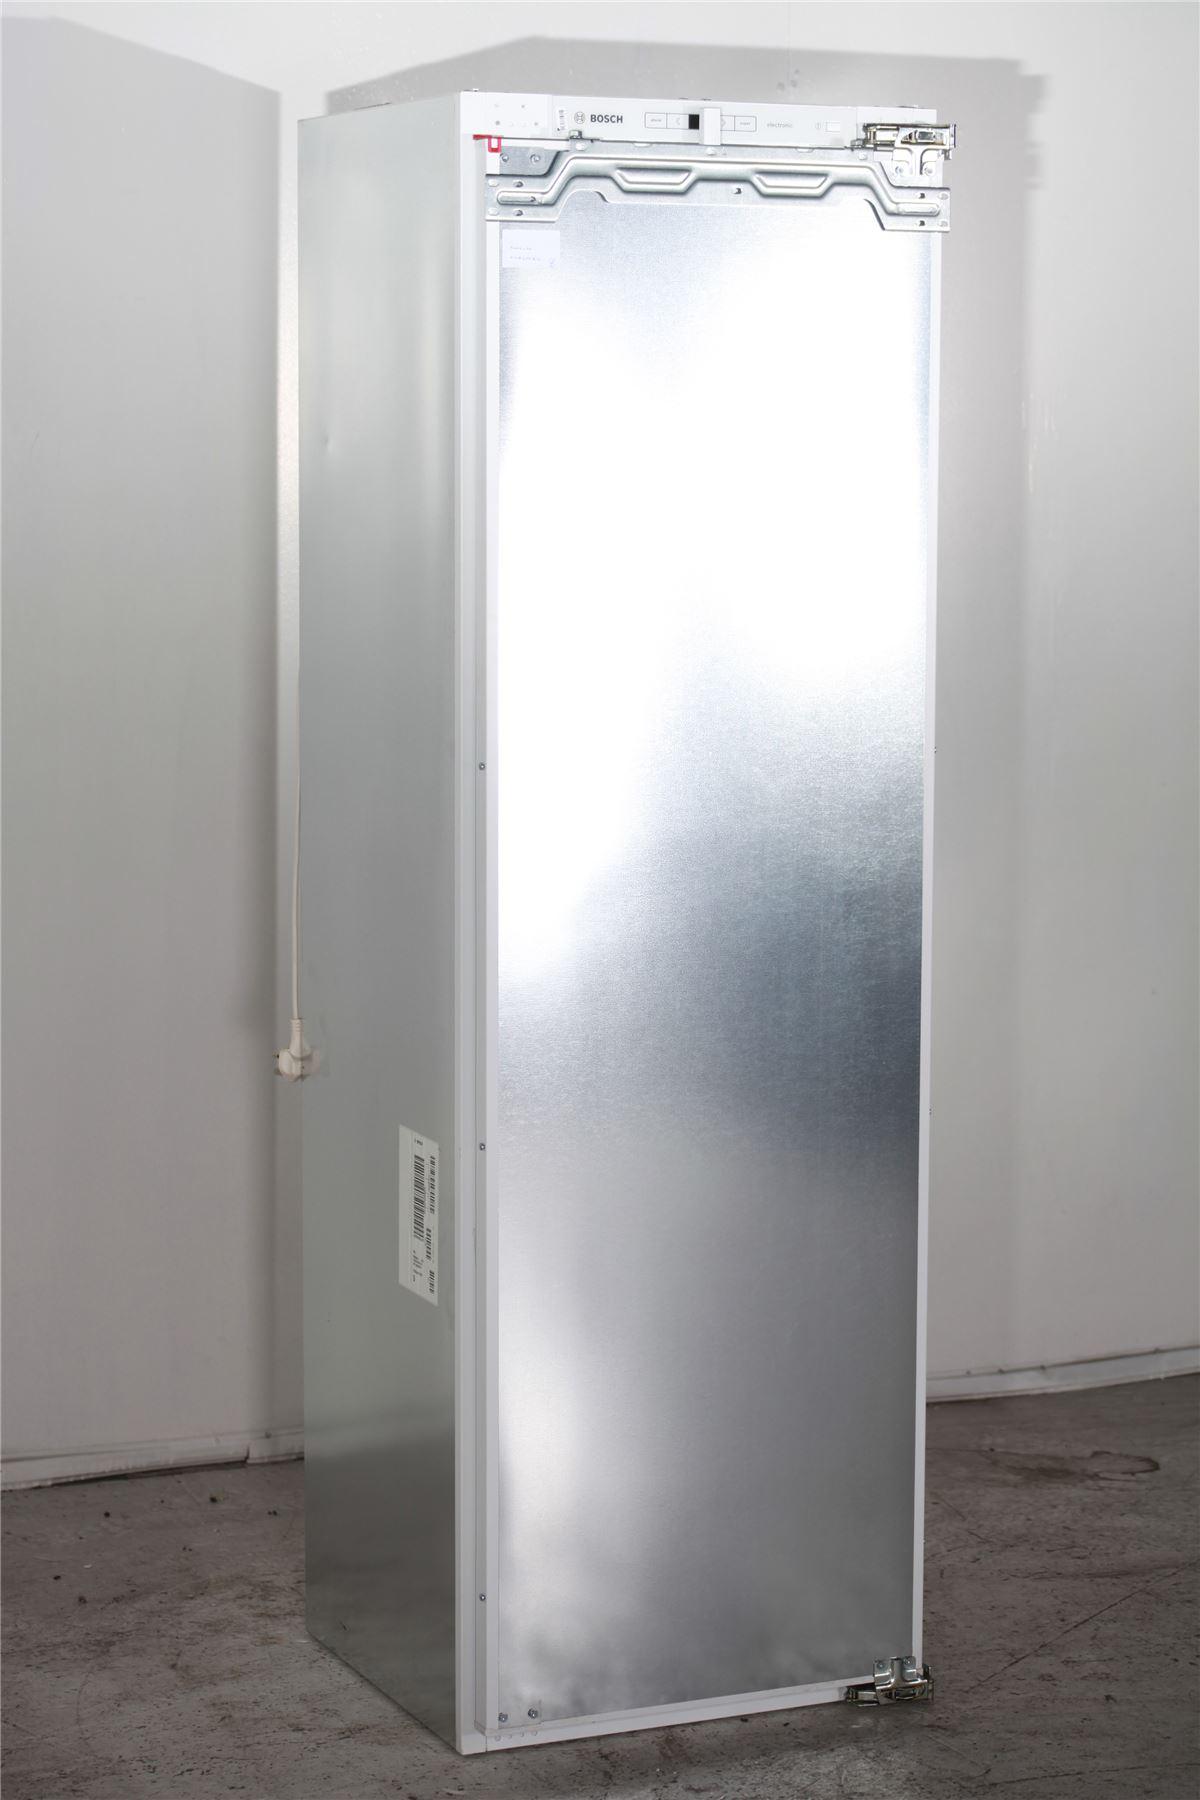 preloved bosch integrated fridge with small freezer. Black Bedroom Furniture Sets. Home Design Ideas